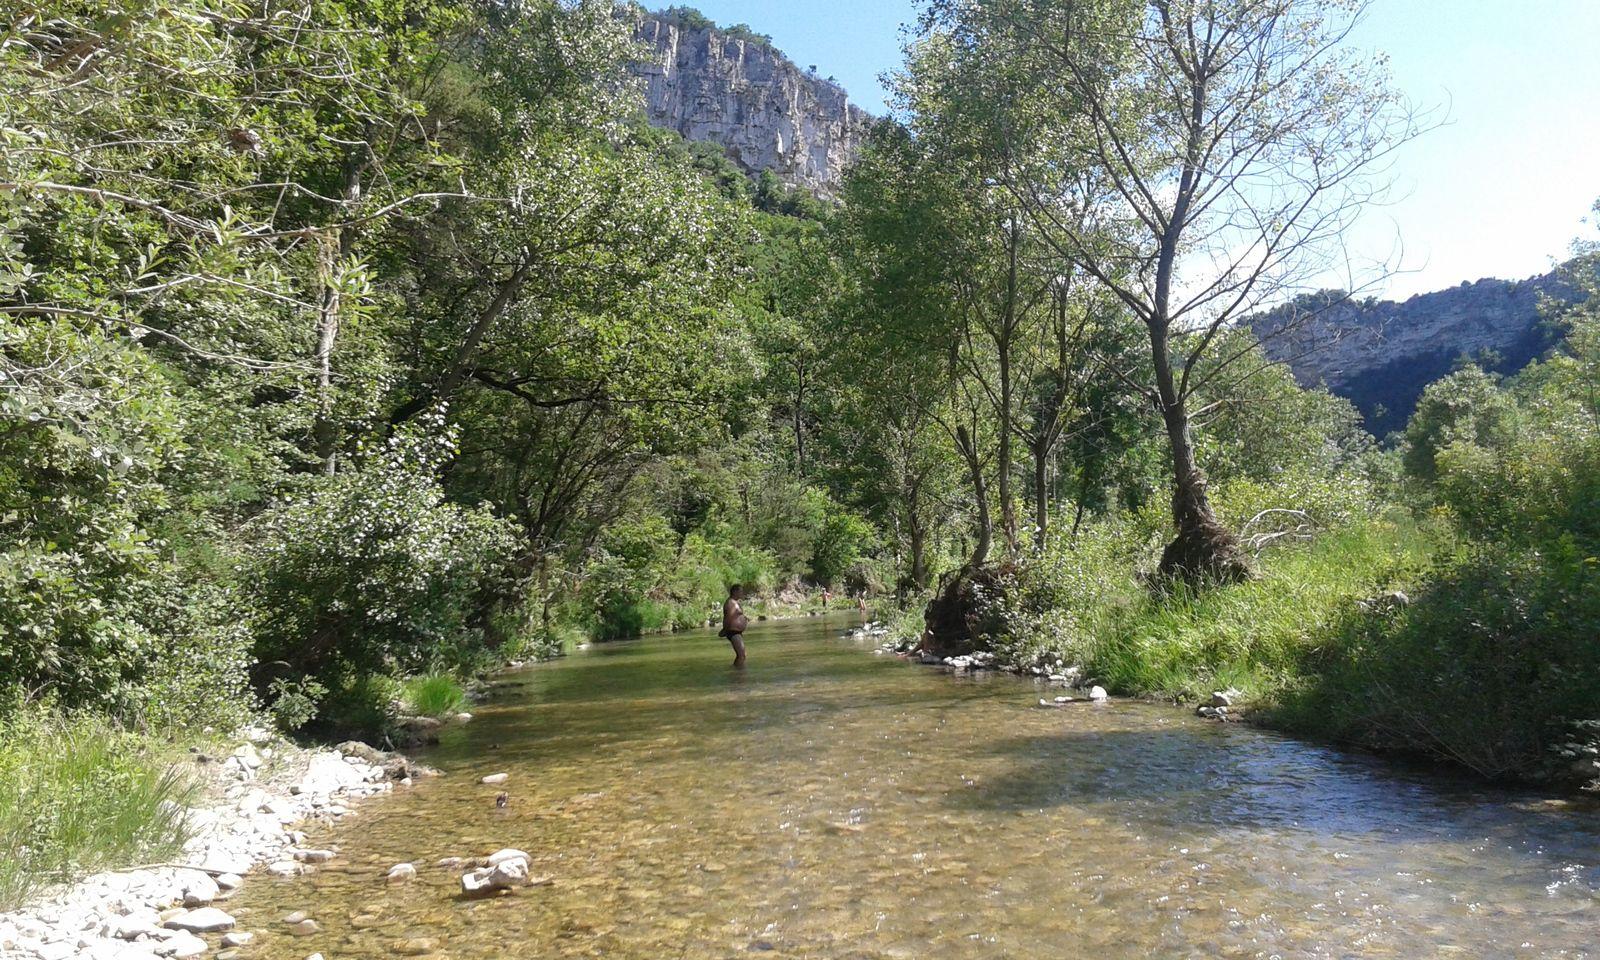 #100km #Youhou #LibertéRetrouvée #Rivière #Potes #Barbeucs #BonsVinsEtDigeos #DrômeMyLove